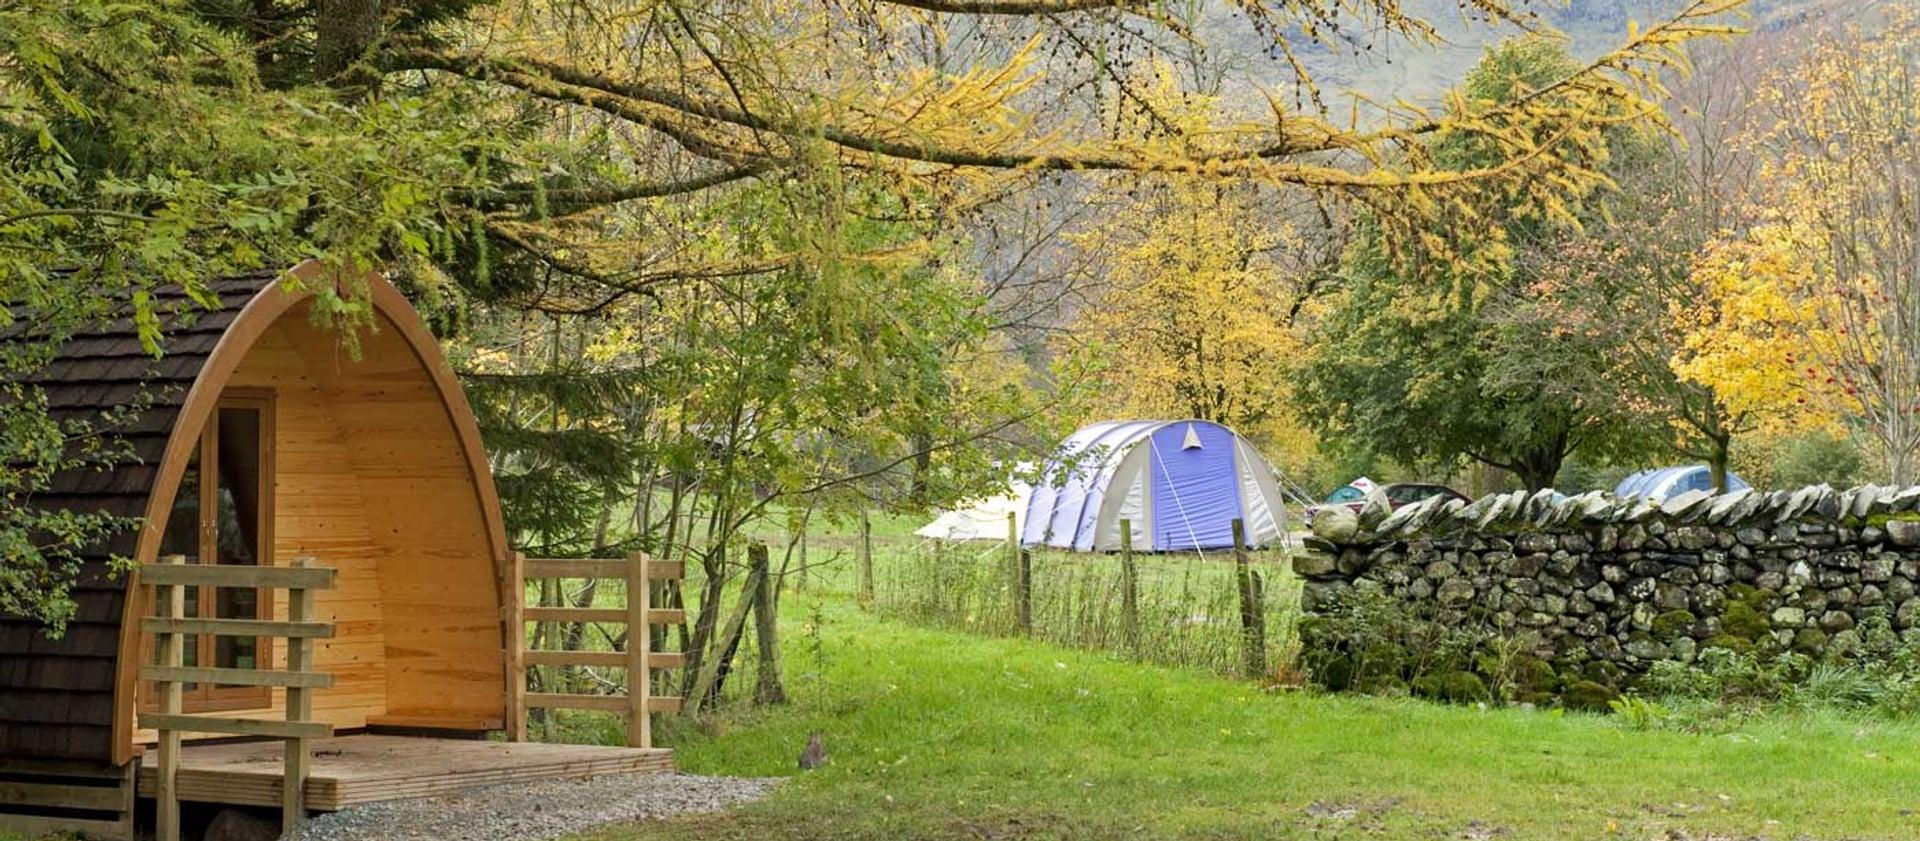 Great Langdale Campsite